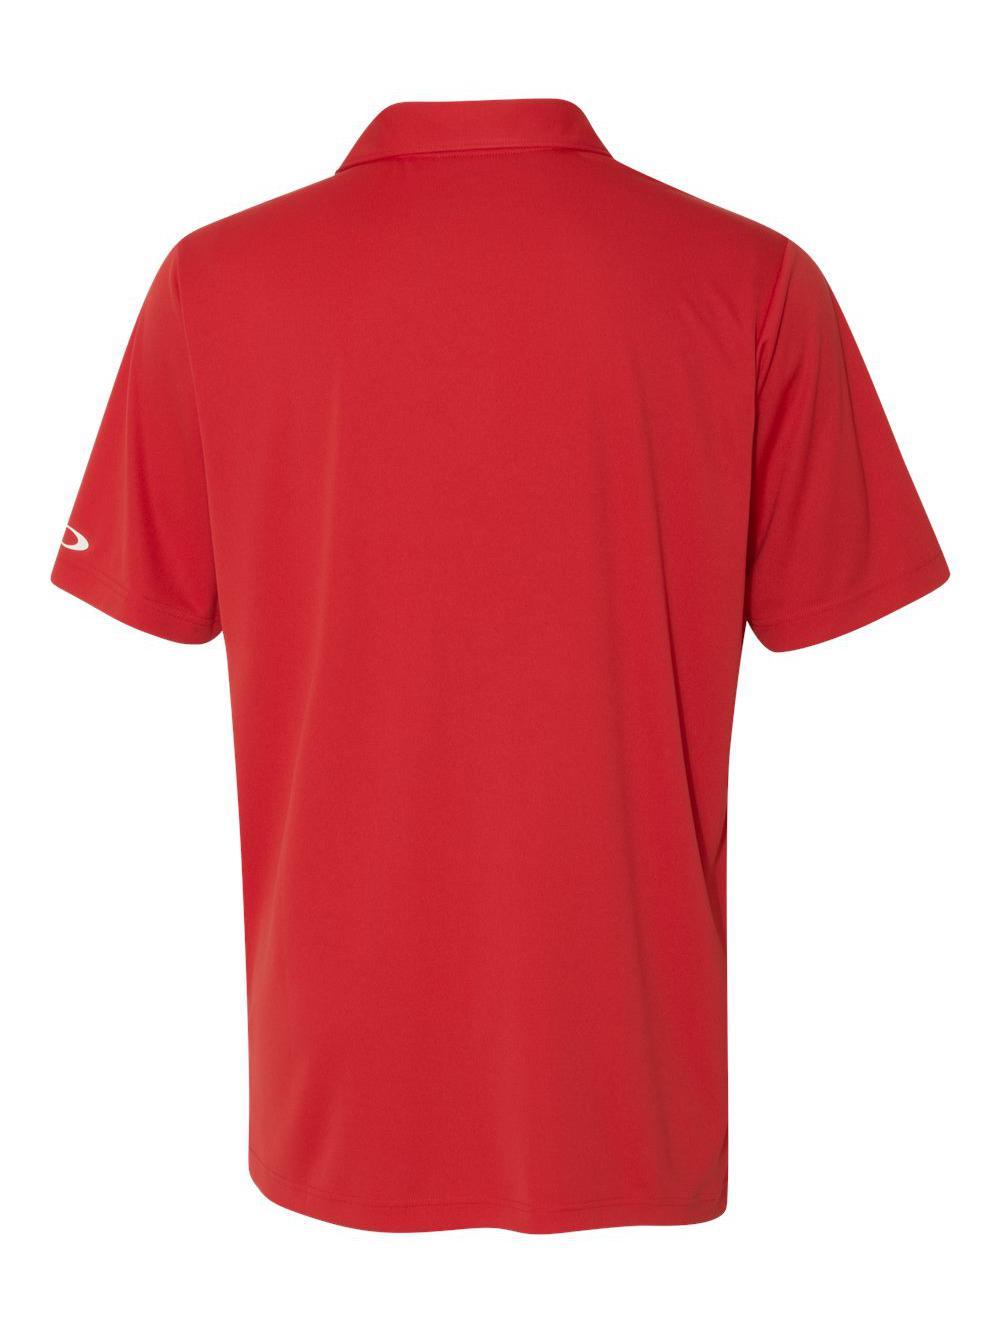 Oakley-Performance-Sport-Shirt-433979ODM thumbnail 13